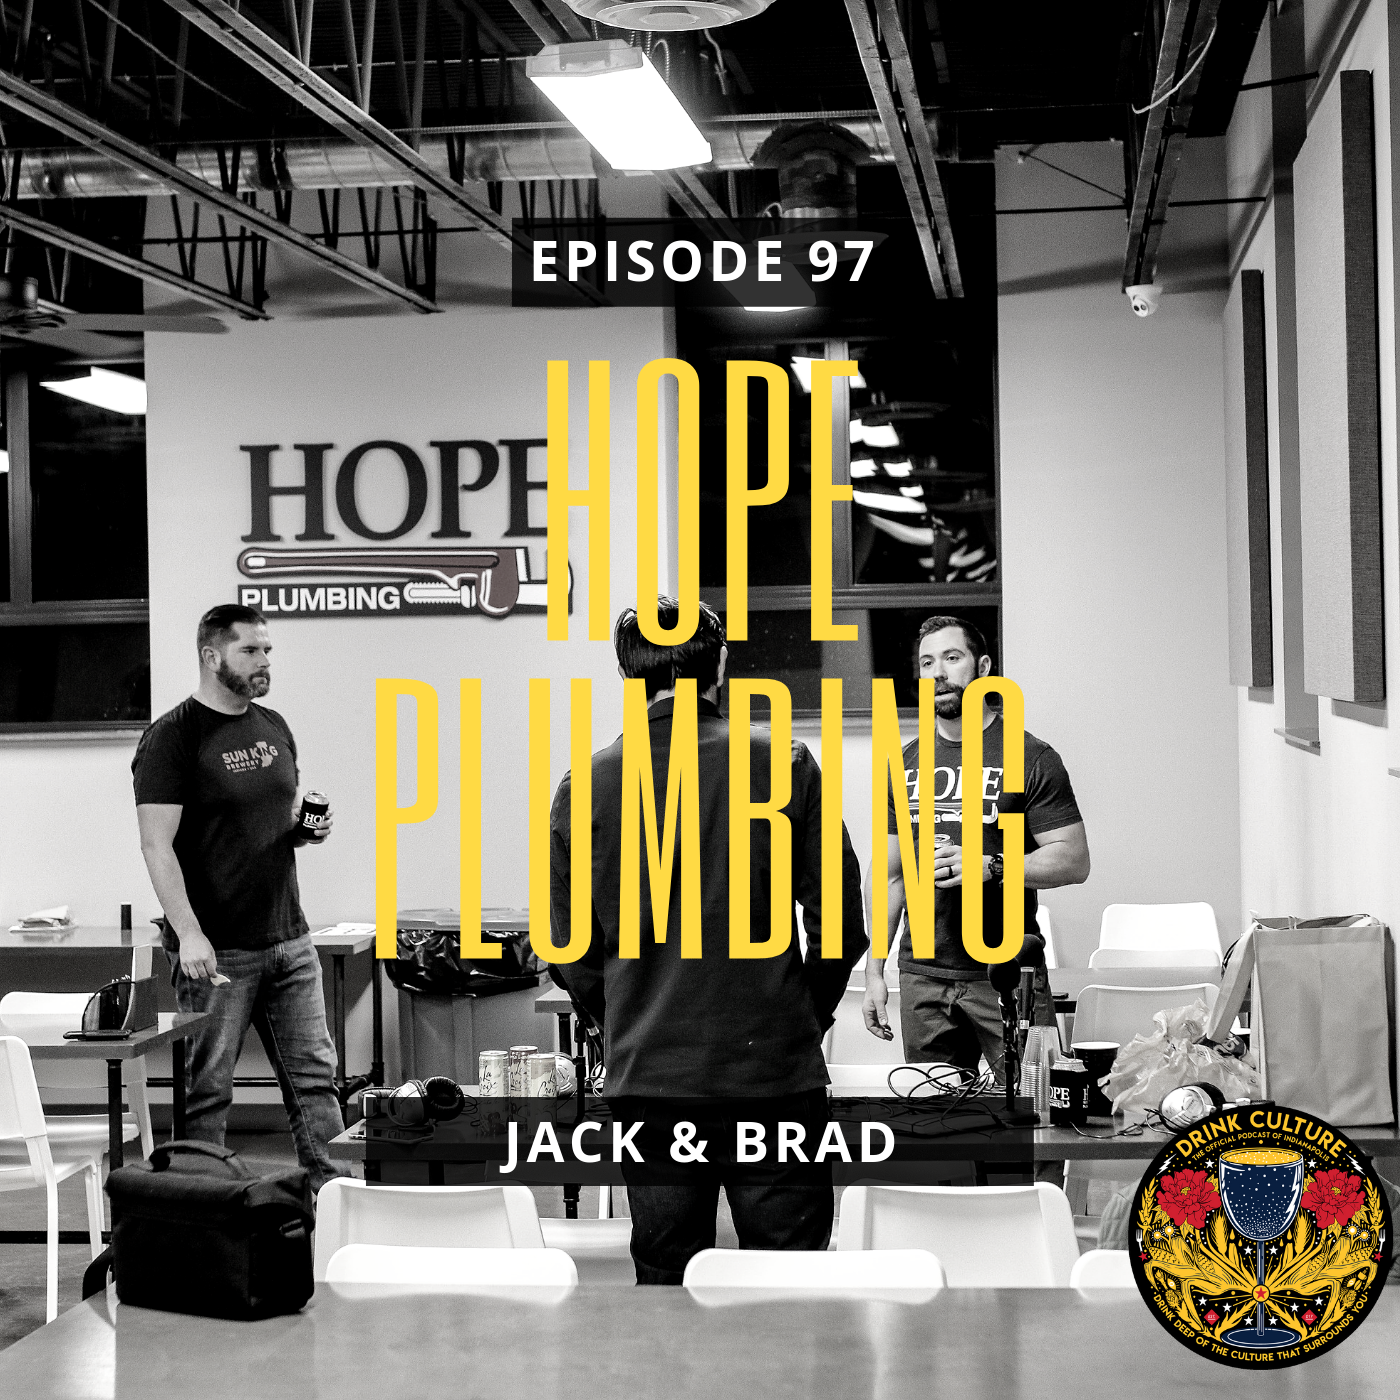 Episode 97: Hope Plumbing, Jack Hope & Brad Persic -